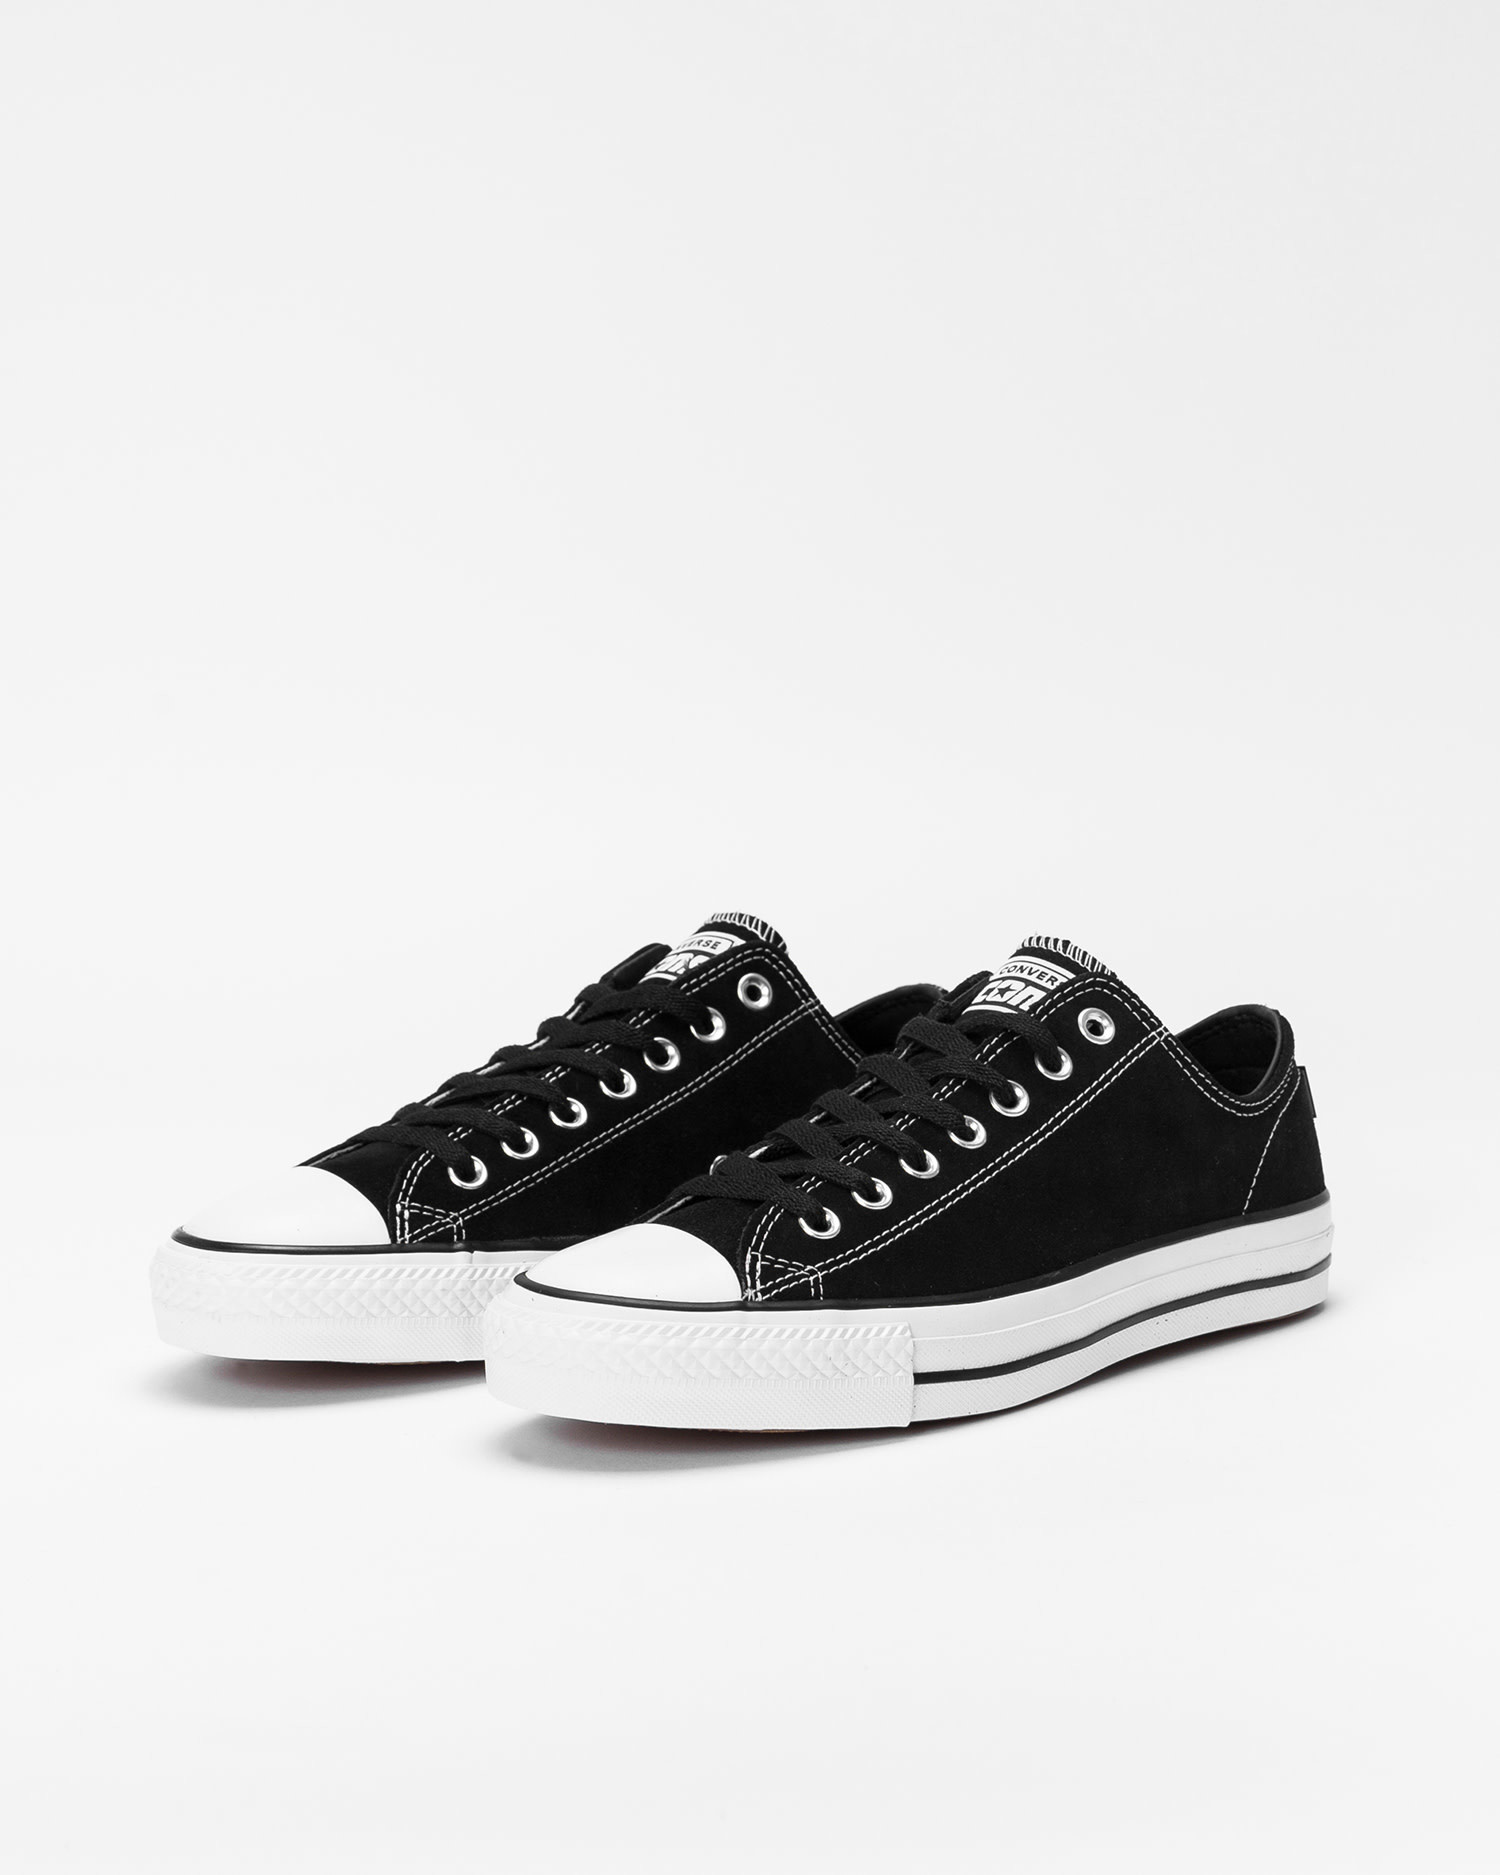 Converse Ctas Pro OX Black/White